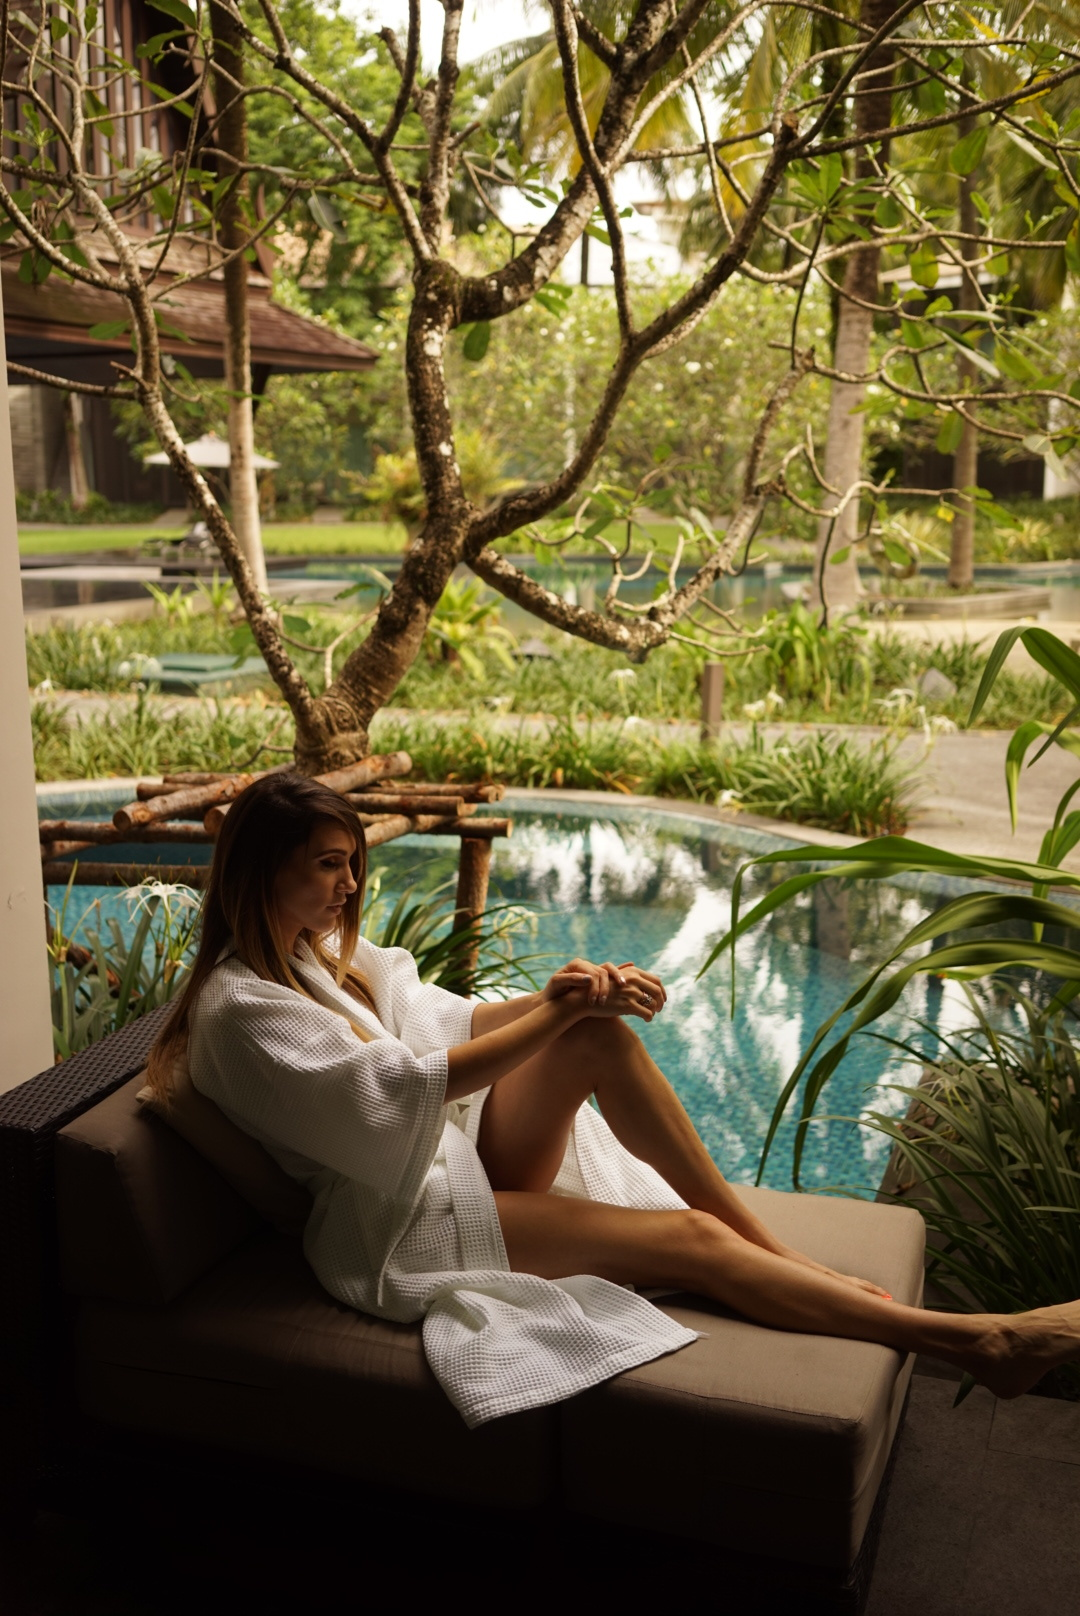 Twin_Palms_Phuket_Thailand_Travel_Blog